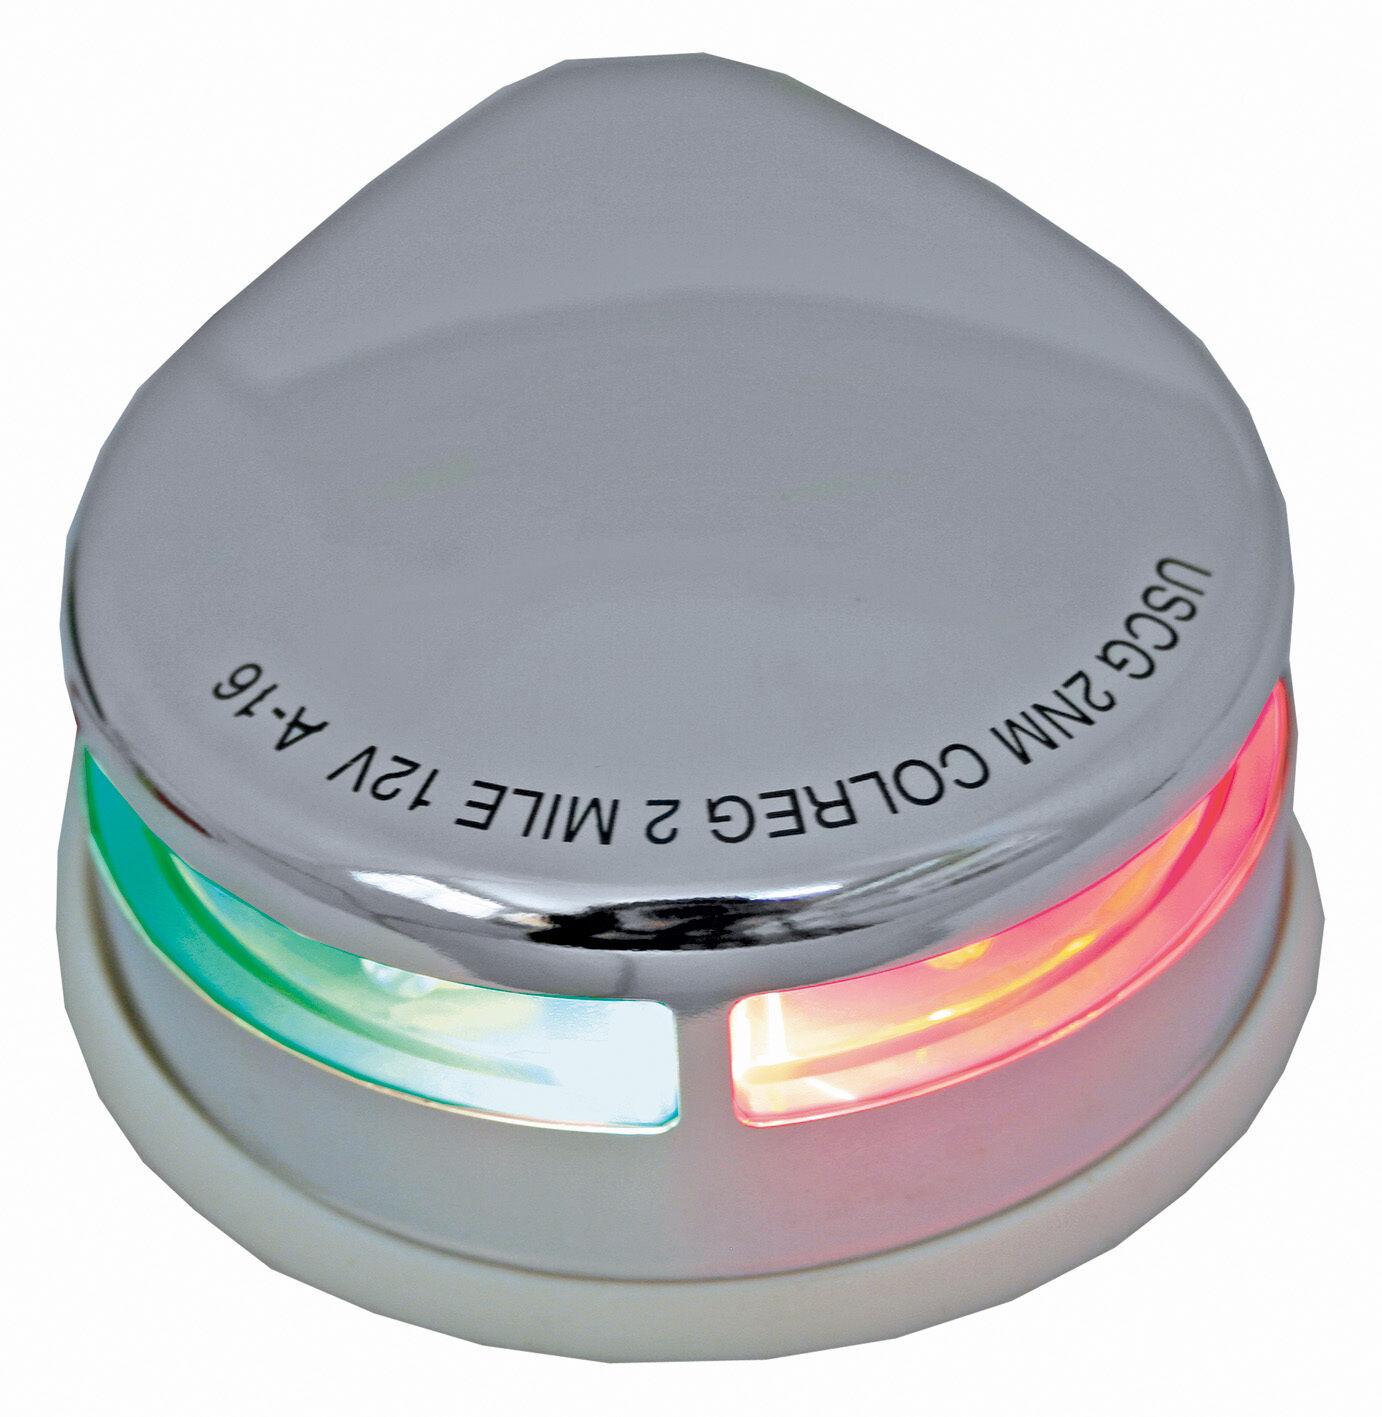 Led Boat Navigation Lights Battery: Boat Navigation Light Stainless Steel Bi-Colour Bow Light